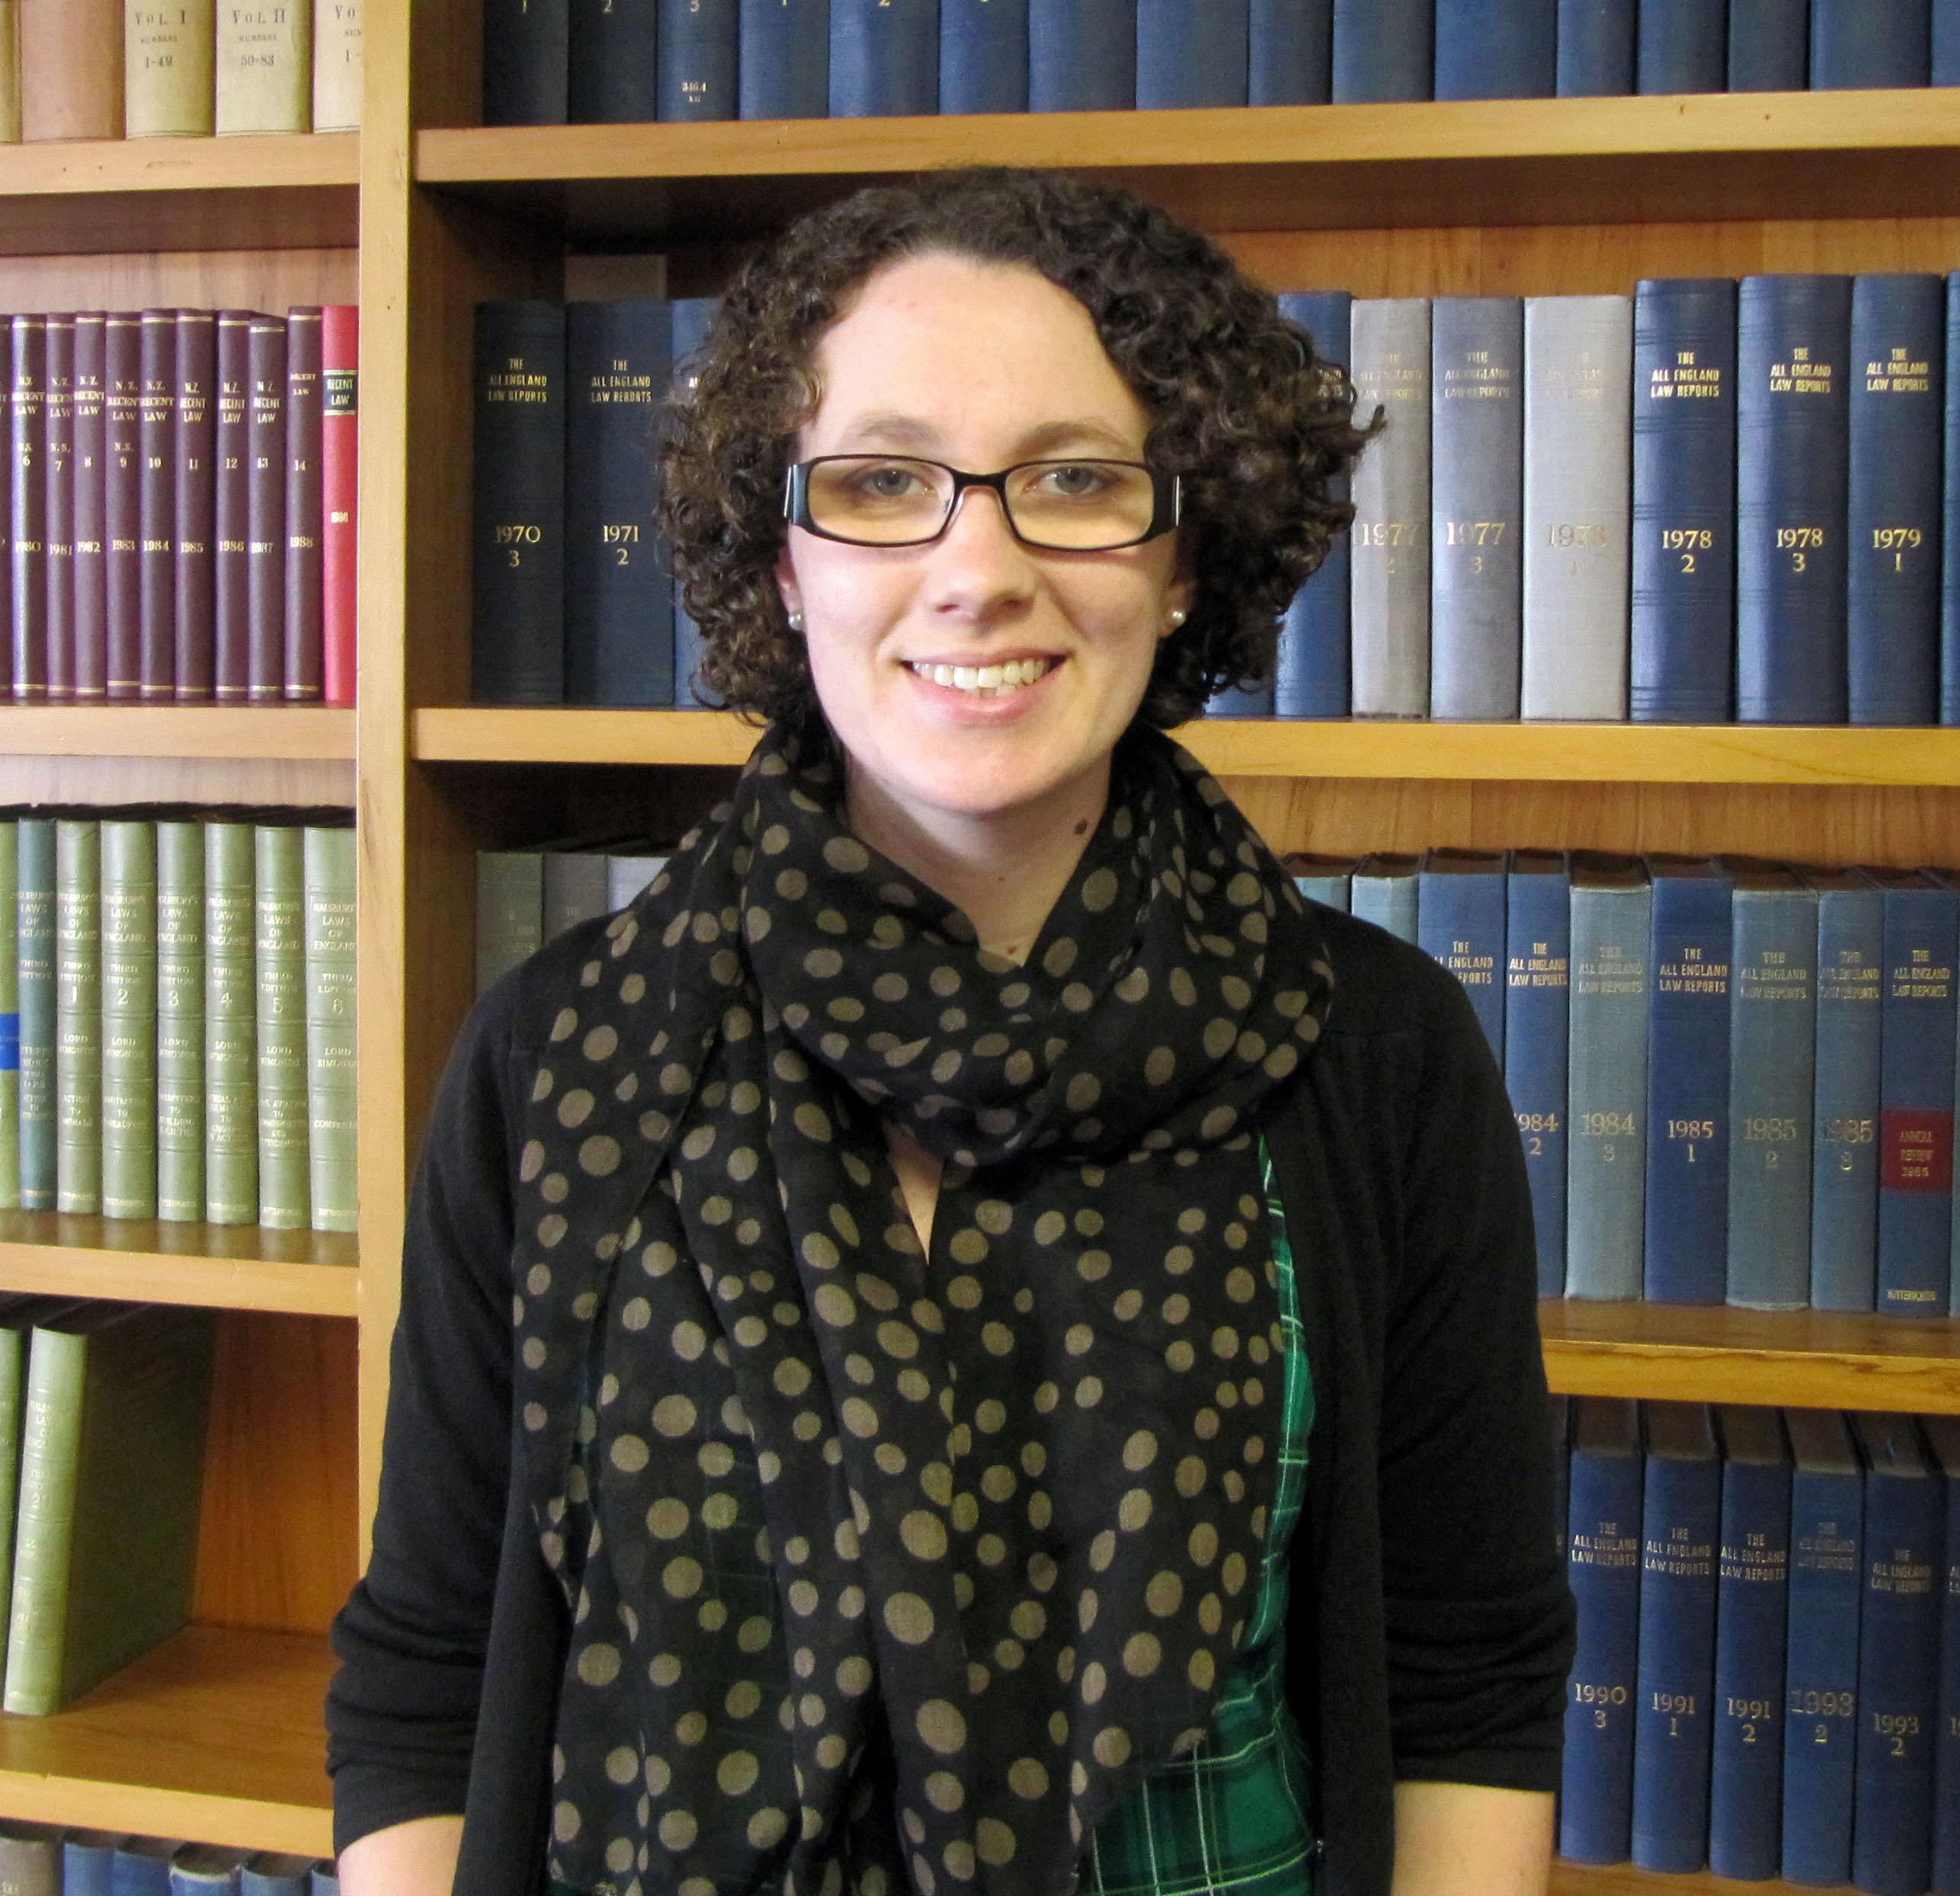 picture LisaGay Hamilton